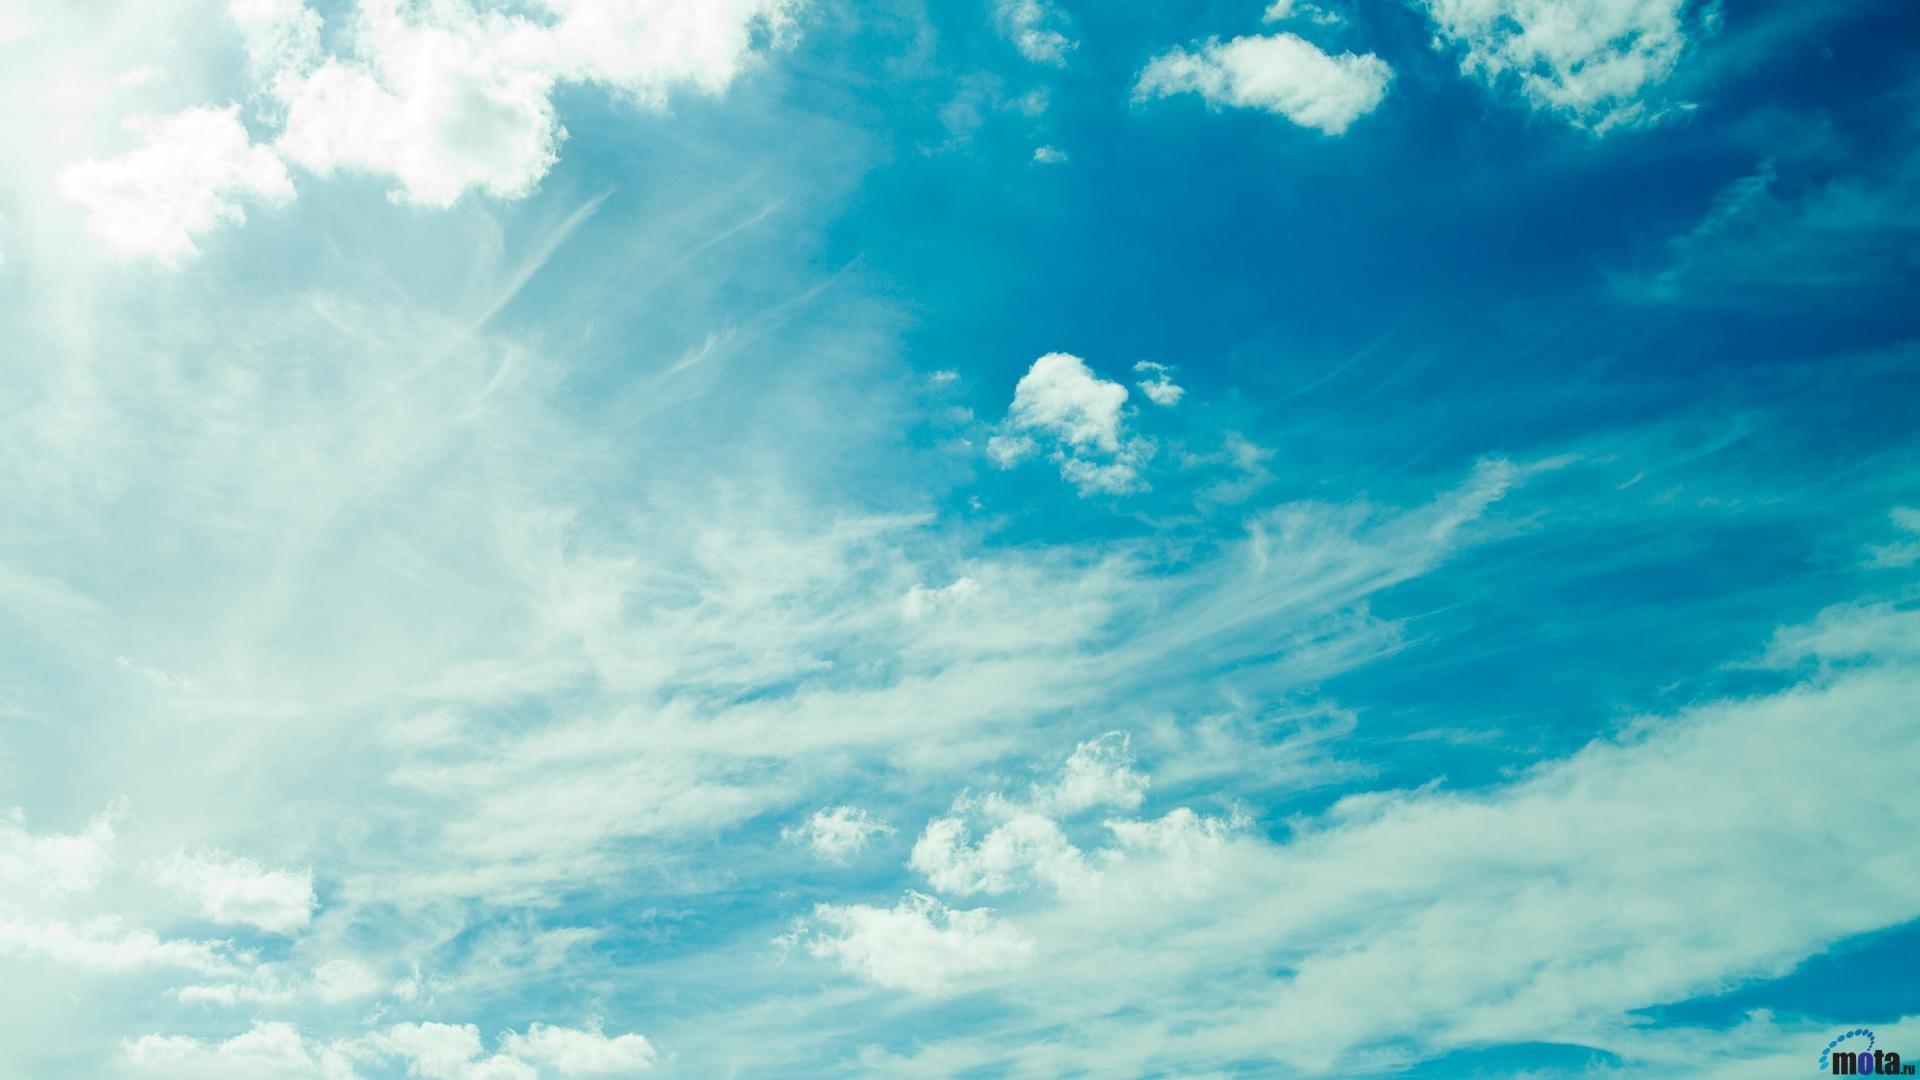 Download Wallpaper Summer sky (1920 x 1080 HDTV 1080p). Desktop .